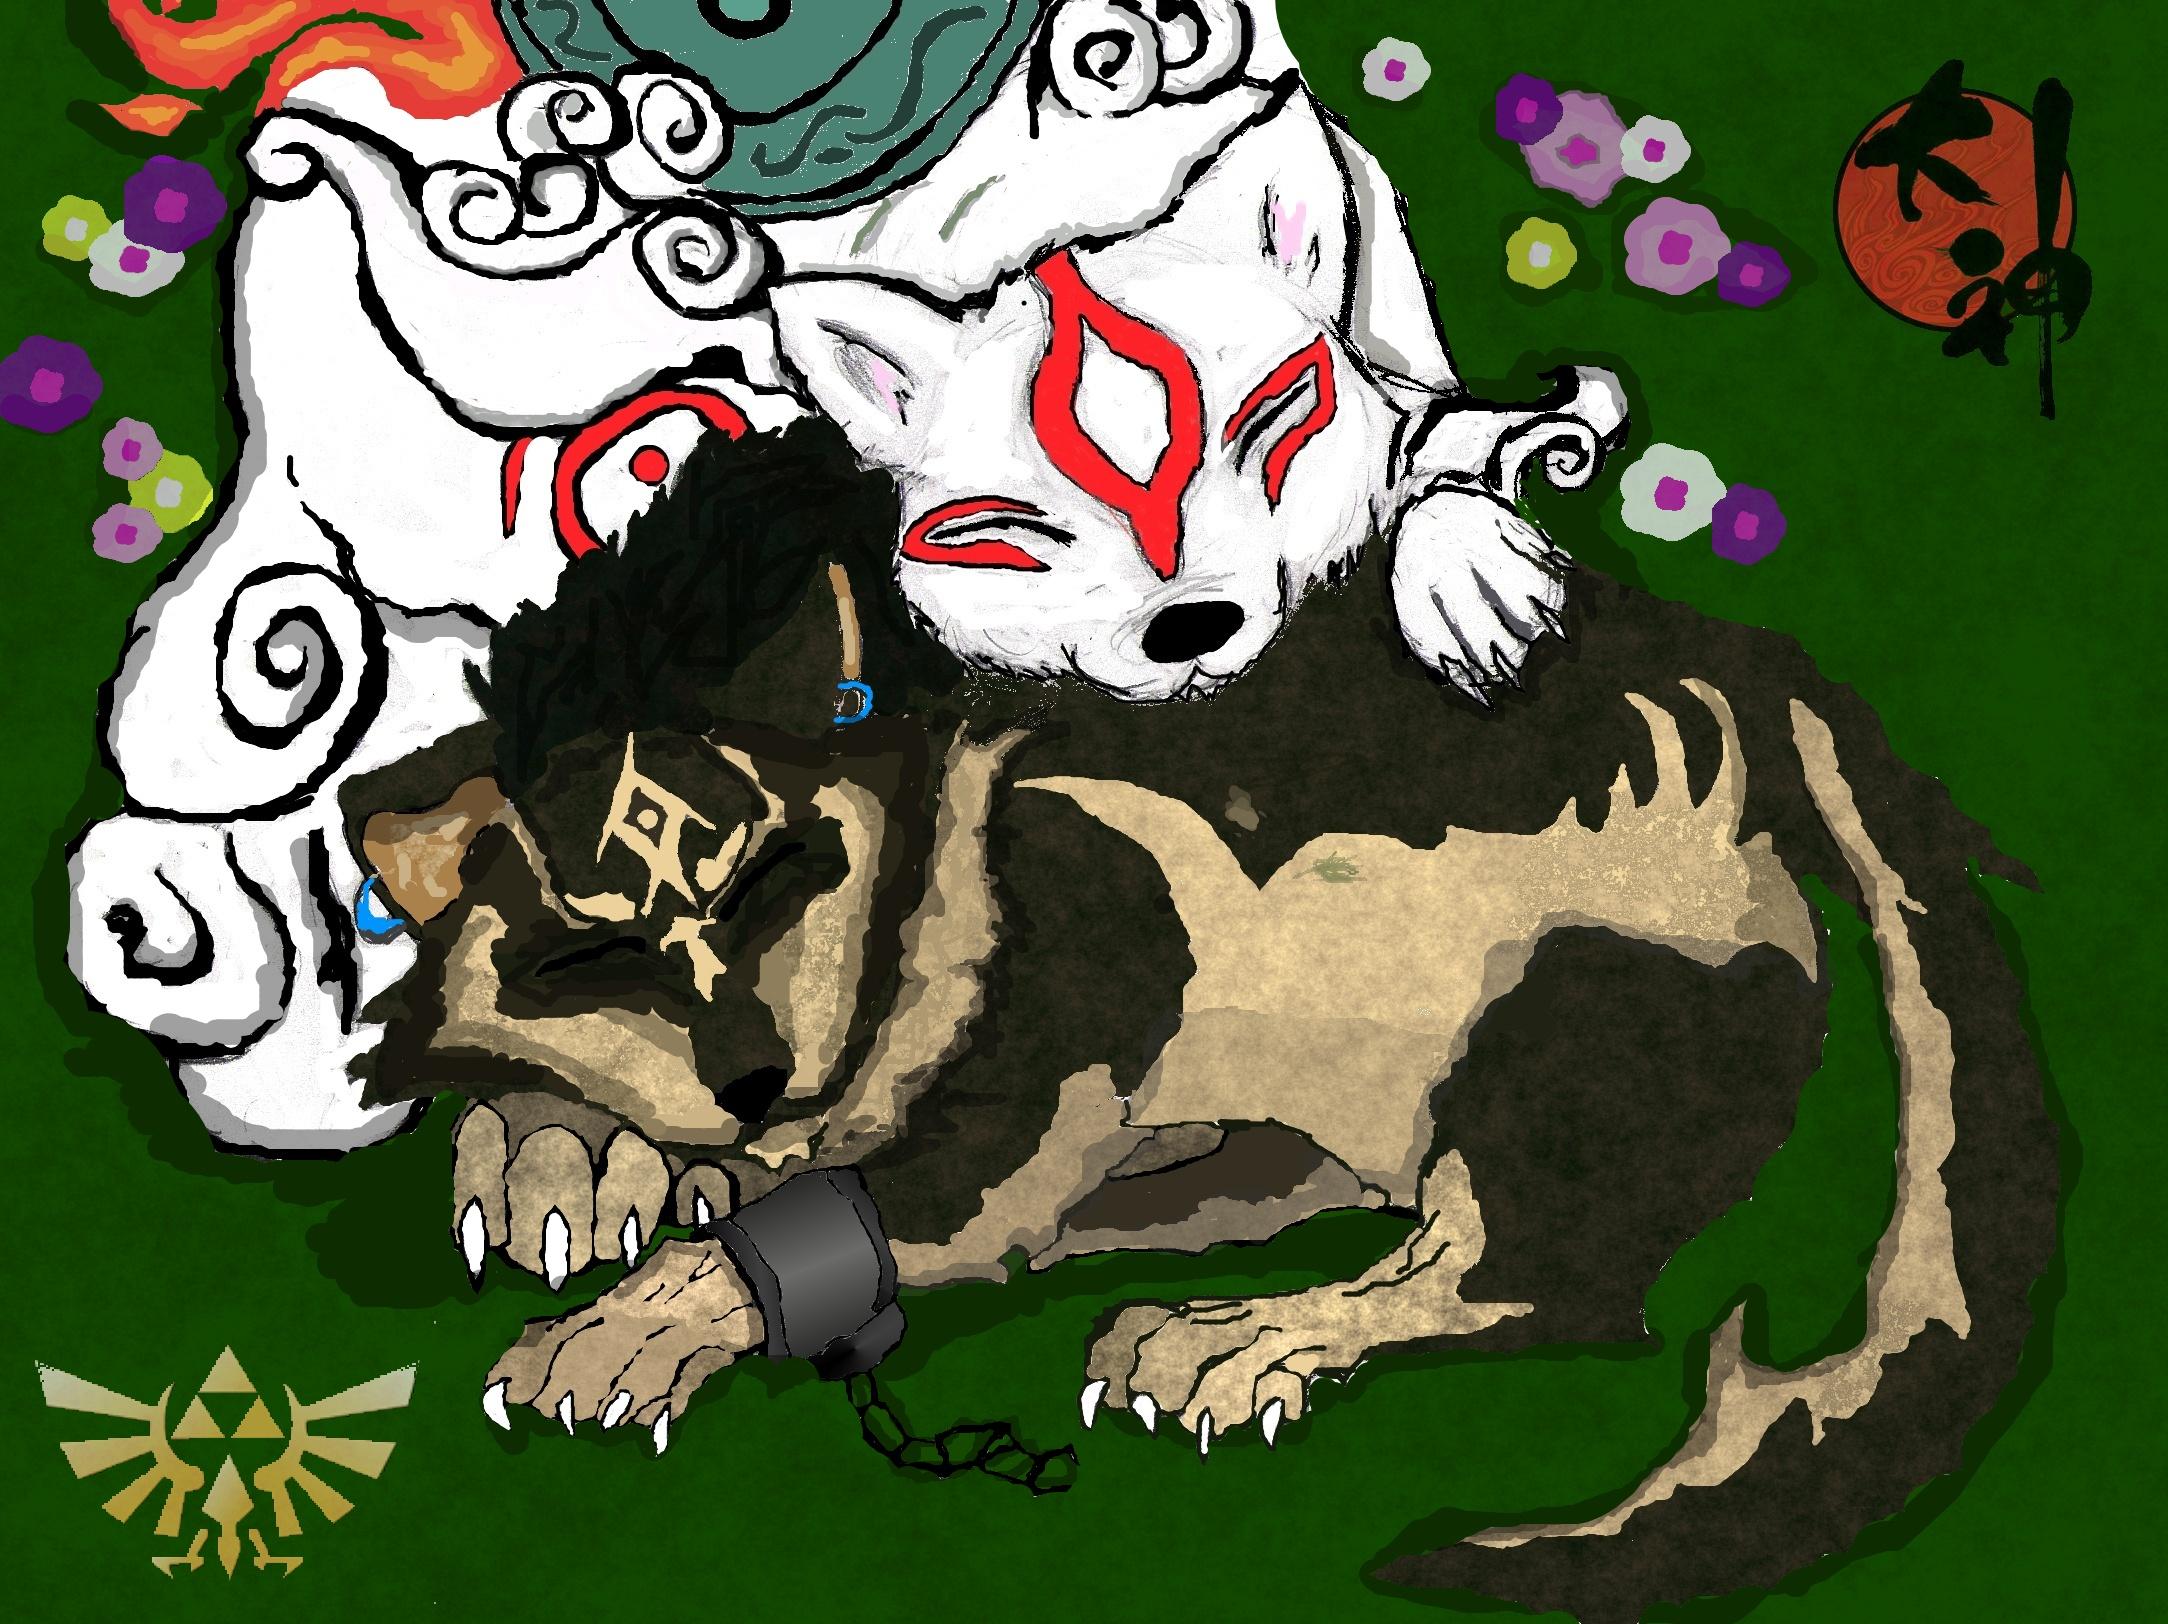 Okami Amaterasu and Wolf Link by aikawarazu-desu on DeviantArt